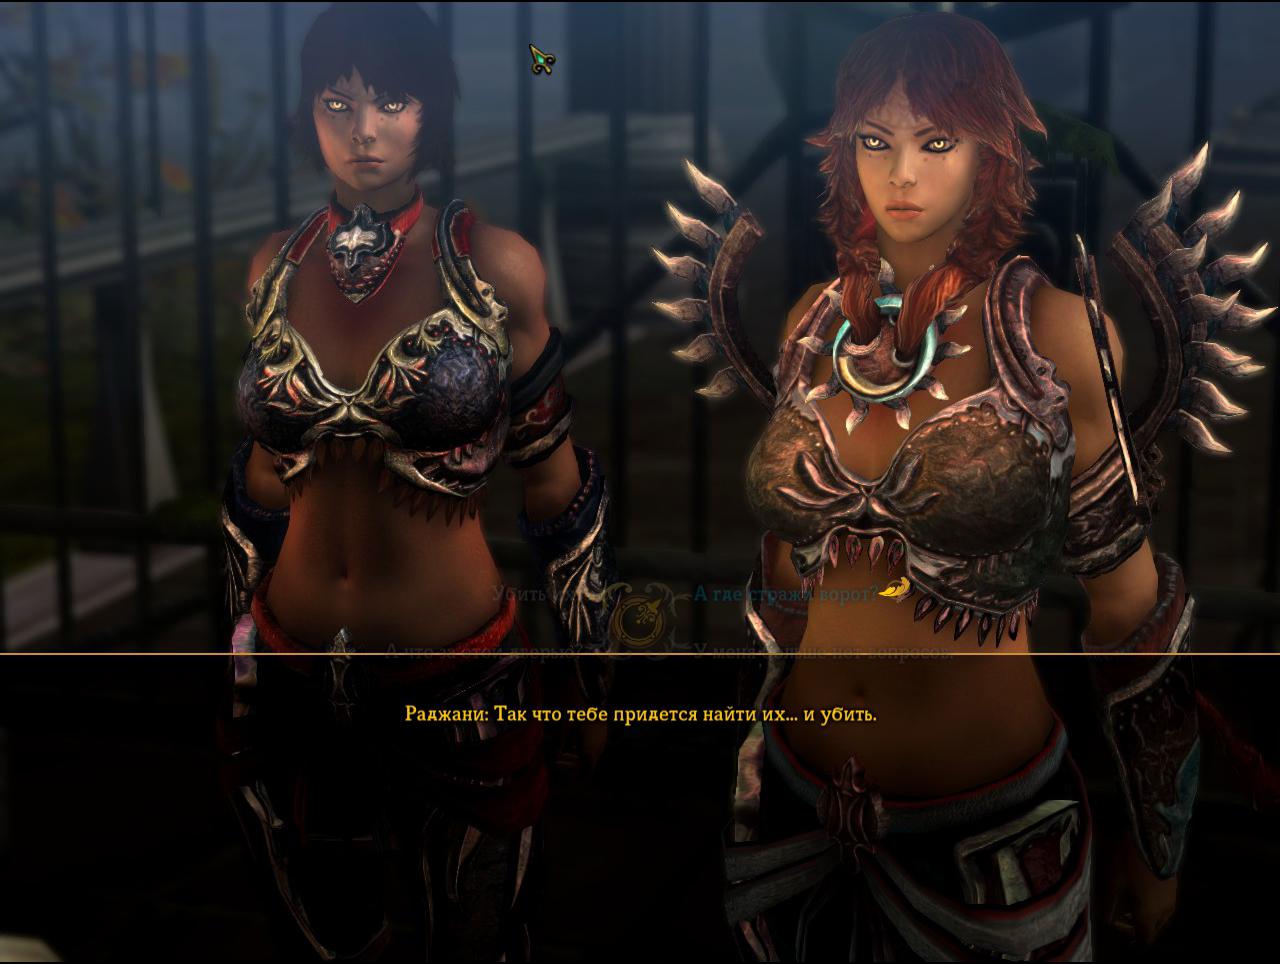 Dungeon siege 3 porn pics erotic photo